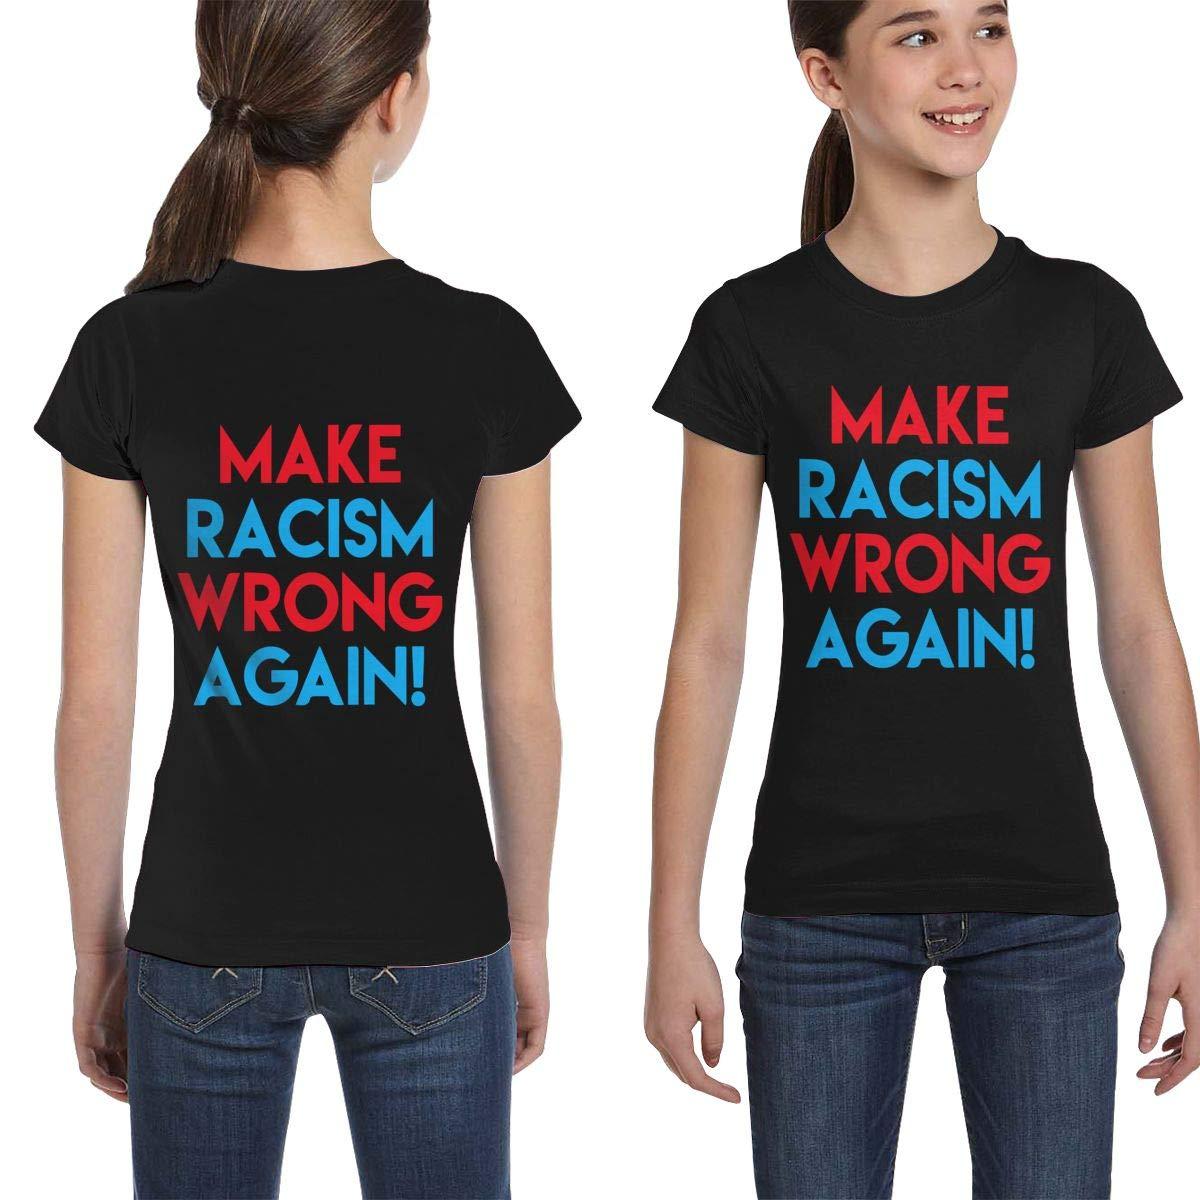 Fashion Tunic Shirt Dress L6Nv4o@A Girls Short Sleeve Make Racism Wrong Again Shirts XS-XL